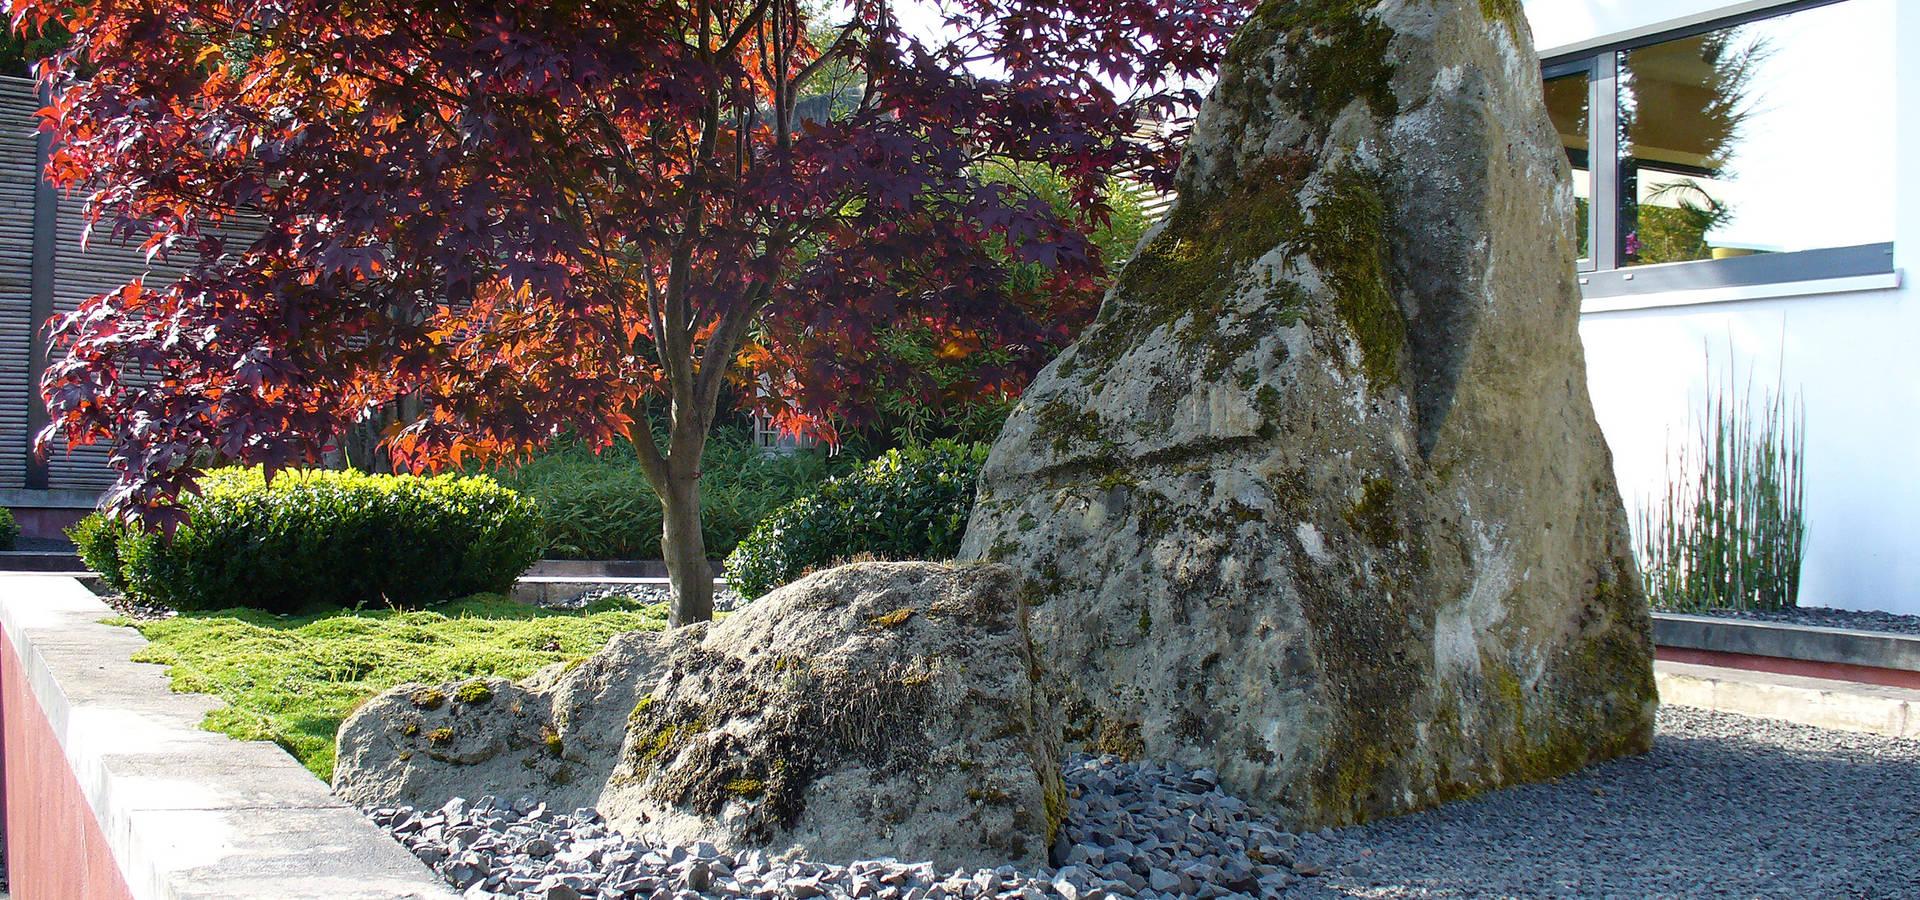 ROJI Japanische Gärten